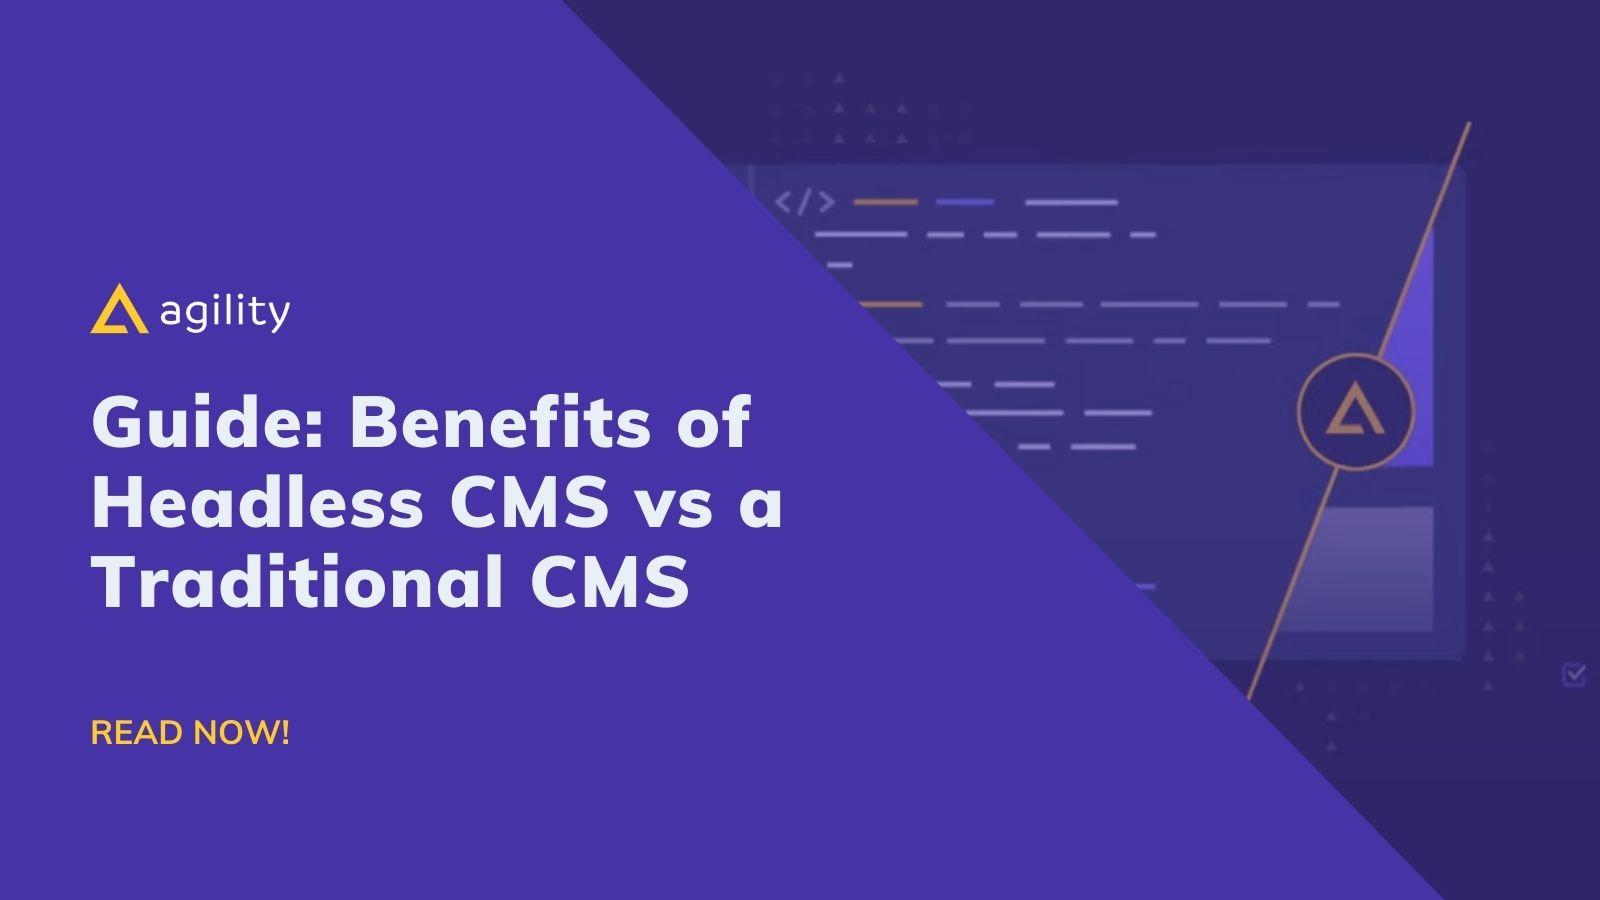 Headless CMS vs a Traditional CMS